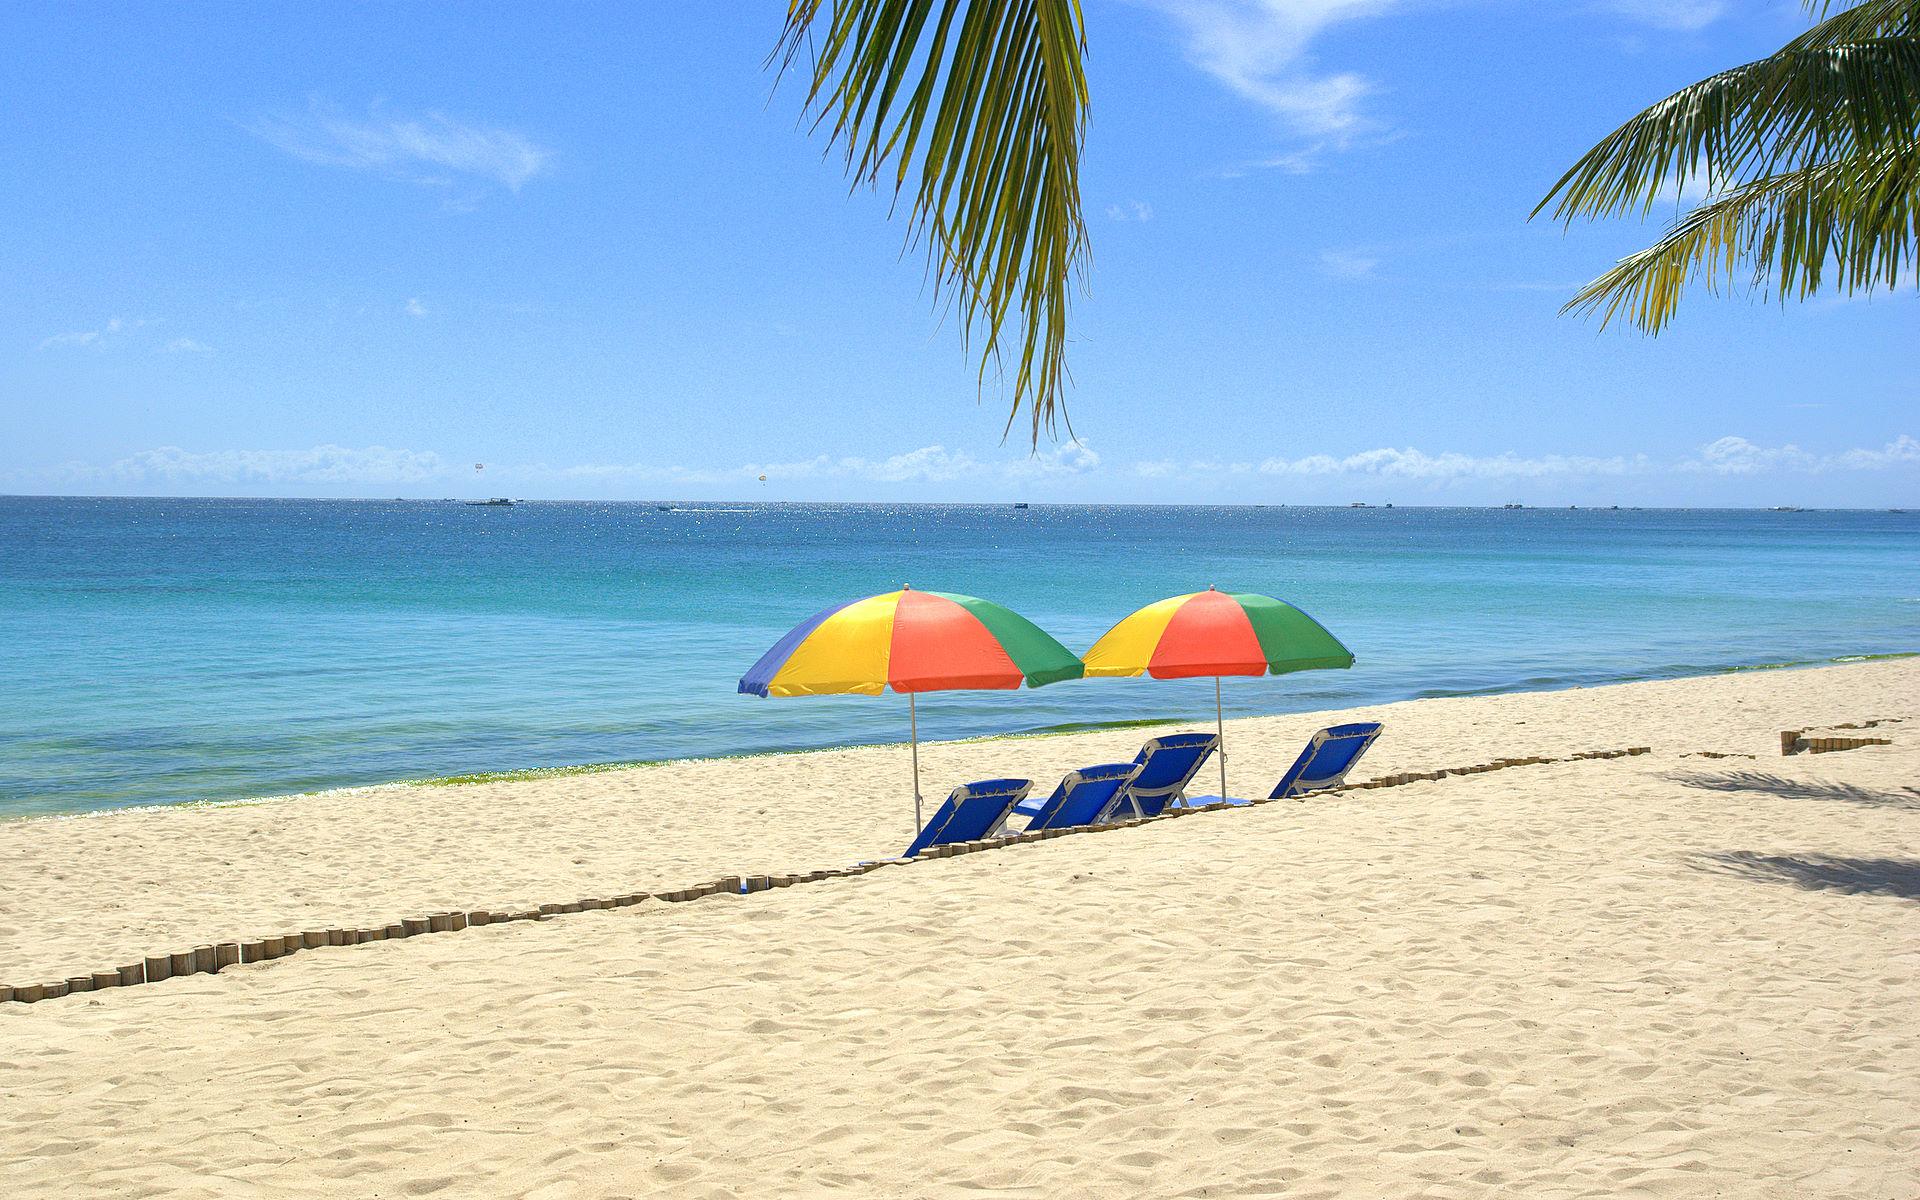 Tropical Beaches Desktop Wallpaper   Download Wallpaper 1920x1200